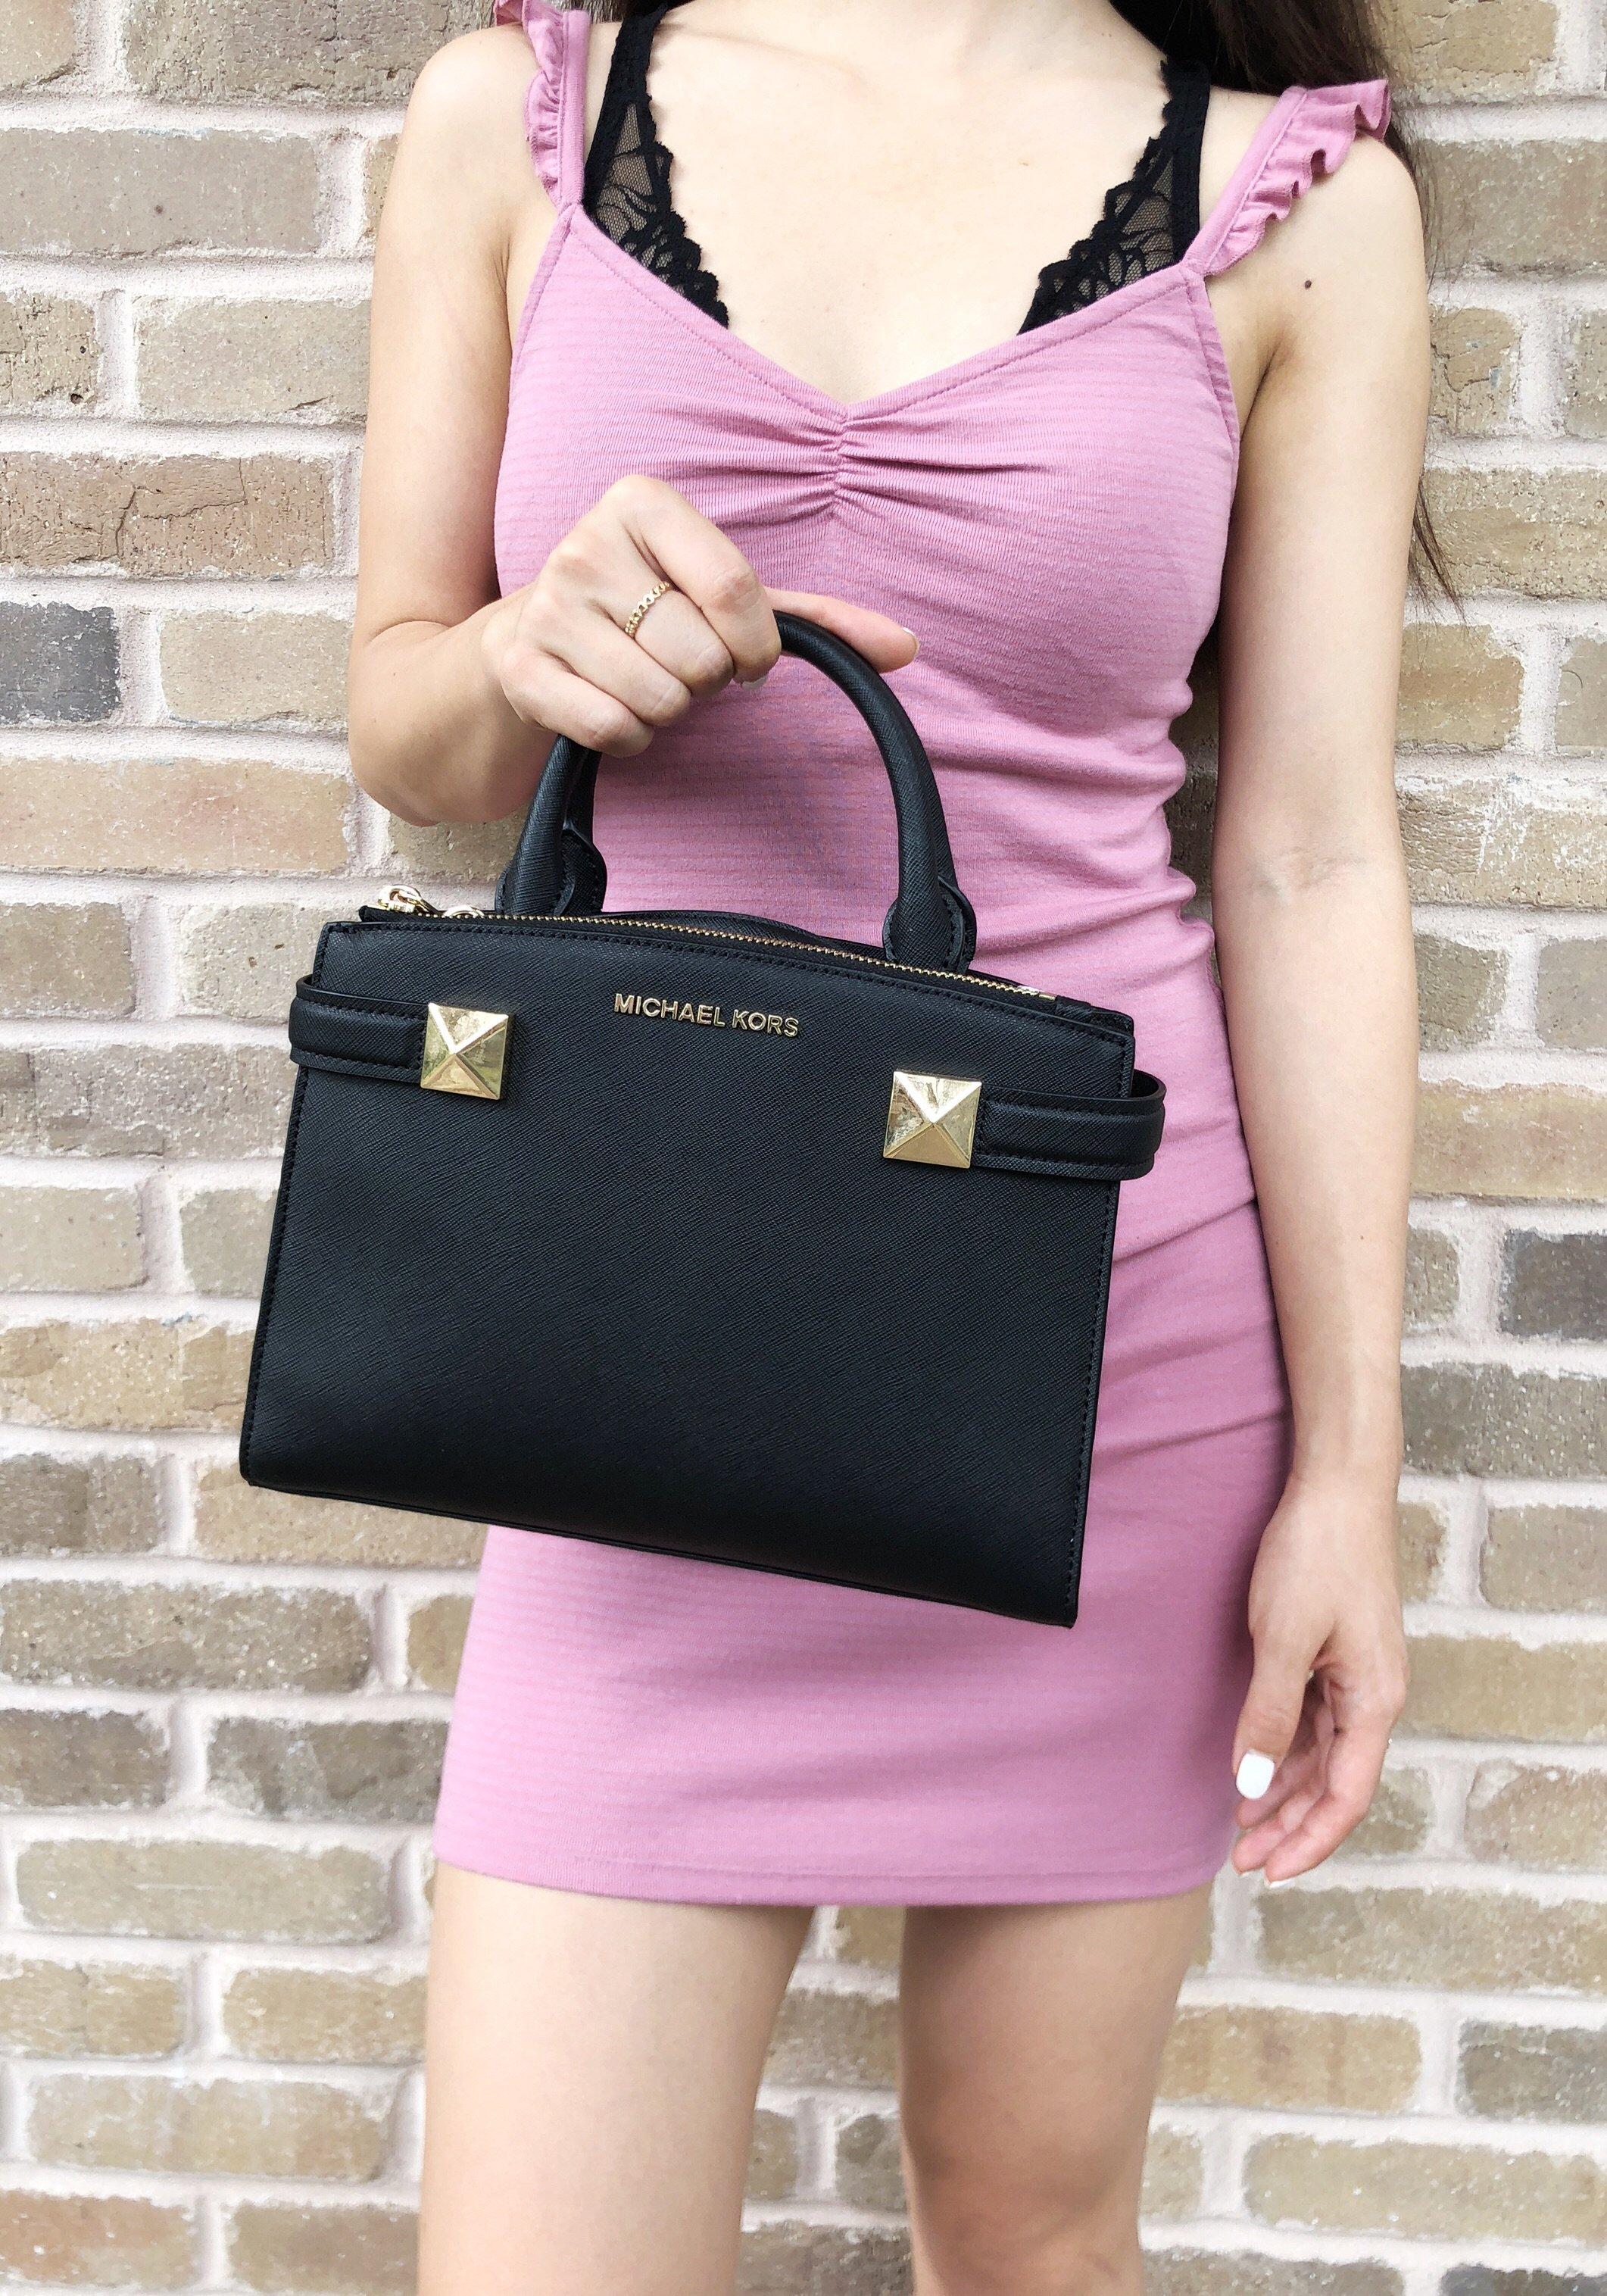 9e0e0569595d96 Michael Kors Karla Small East West Satchel Bag Black Leather 2 2 of 8 ...